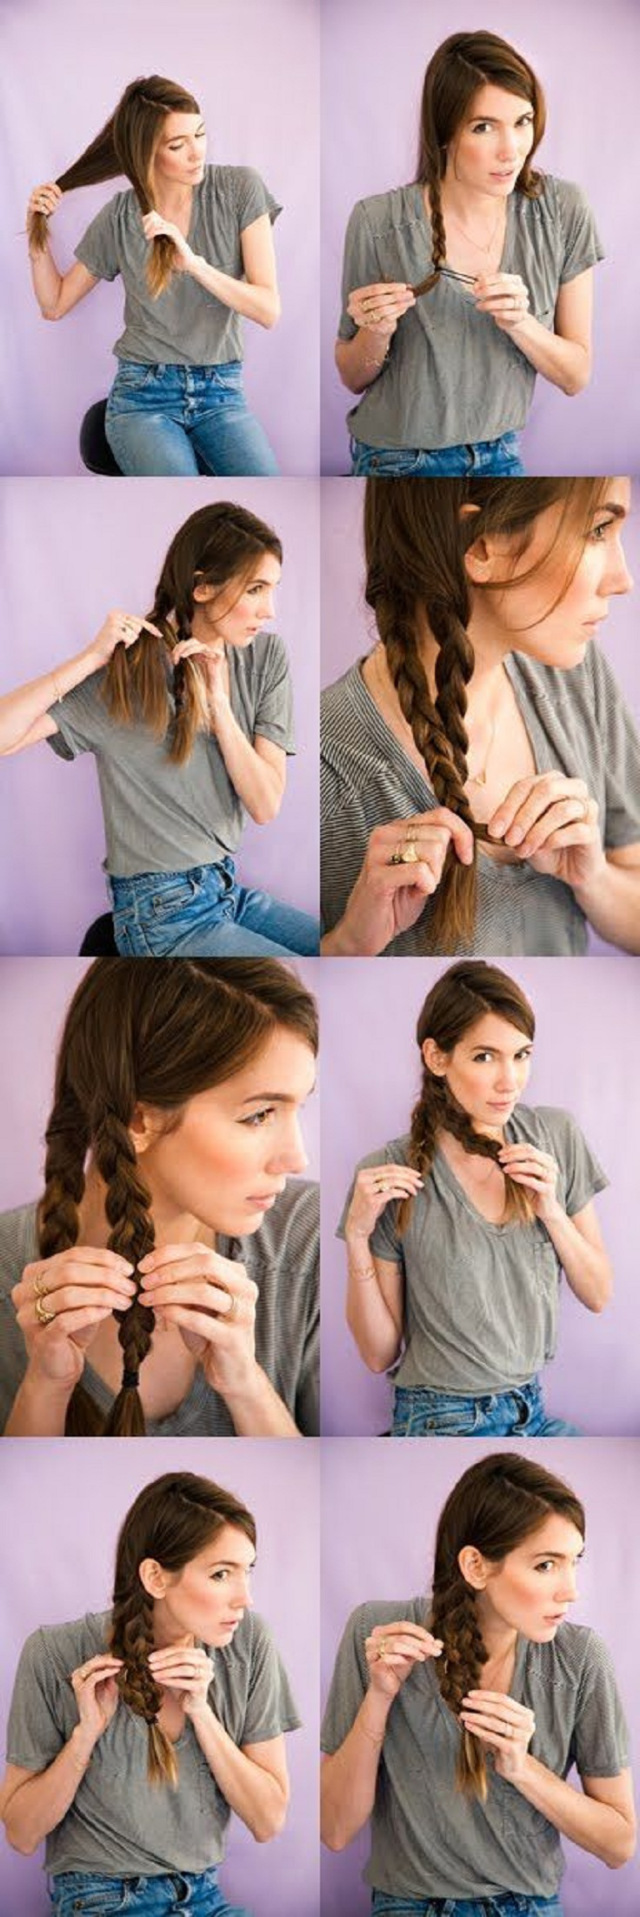 Mermaid tail braid tutorial cute and easy braided hairstyle